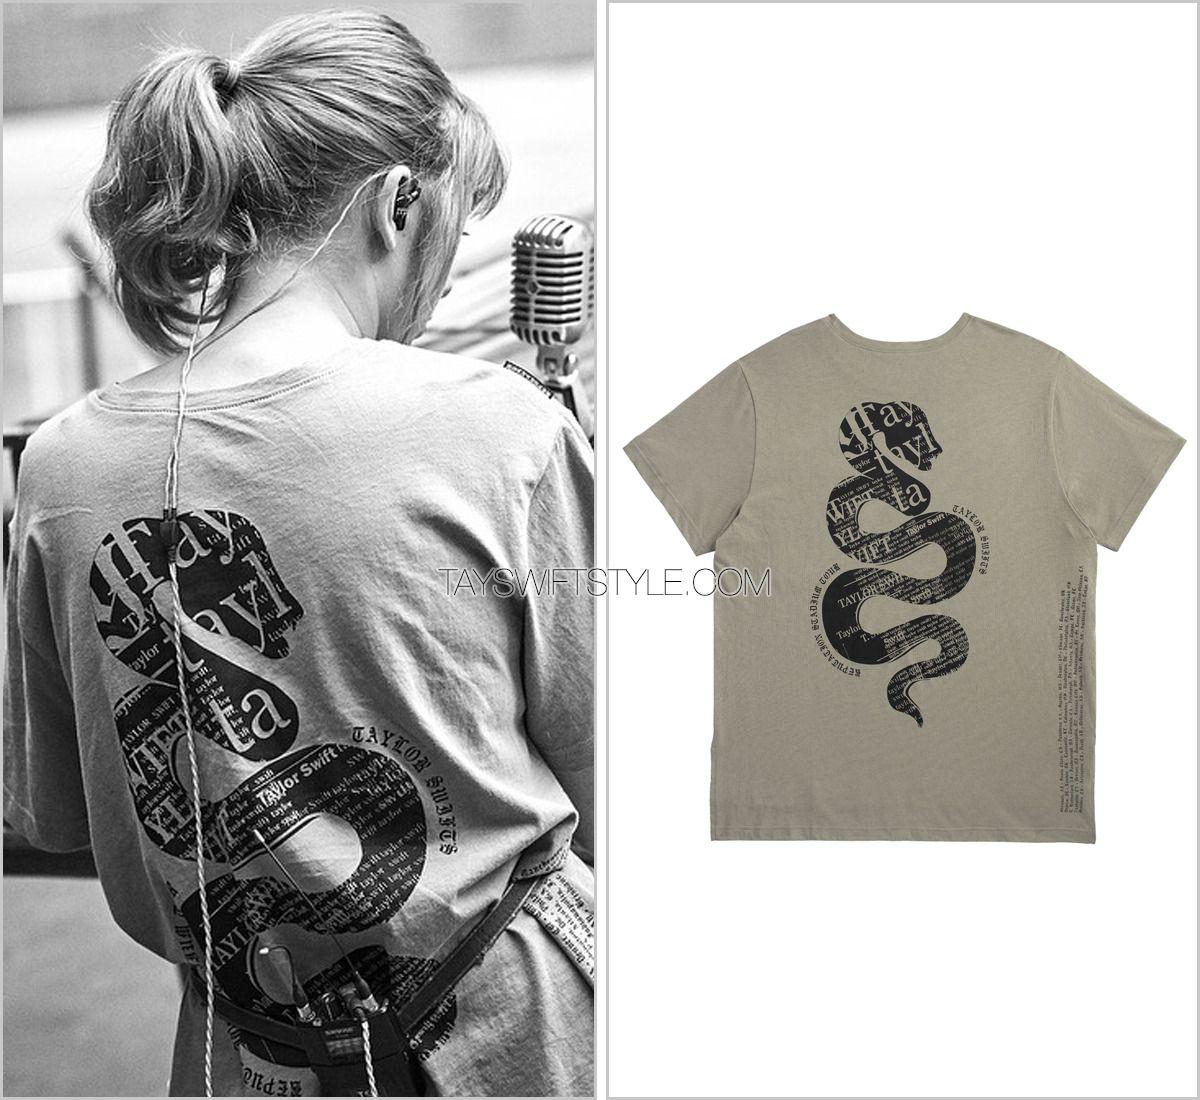 Taylor Swift Style Taylor Swift Merchandise Taylor Swift Repuation Taylor Swift Style